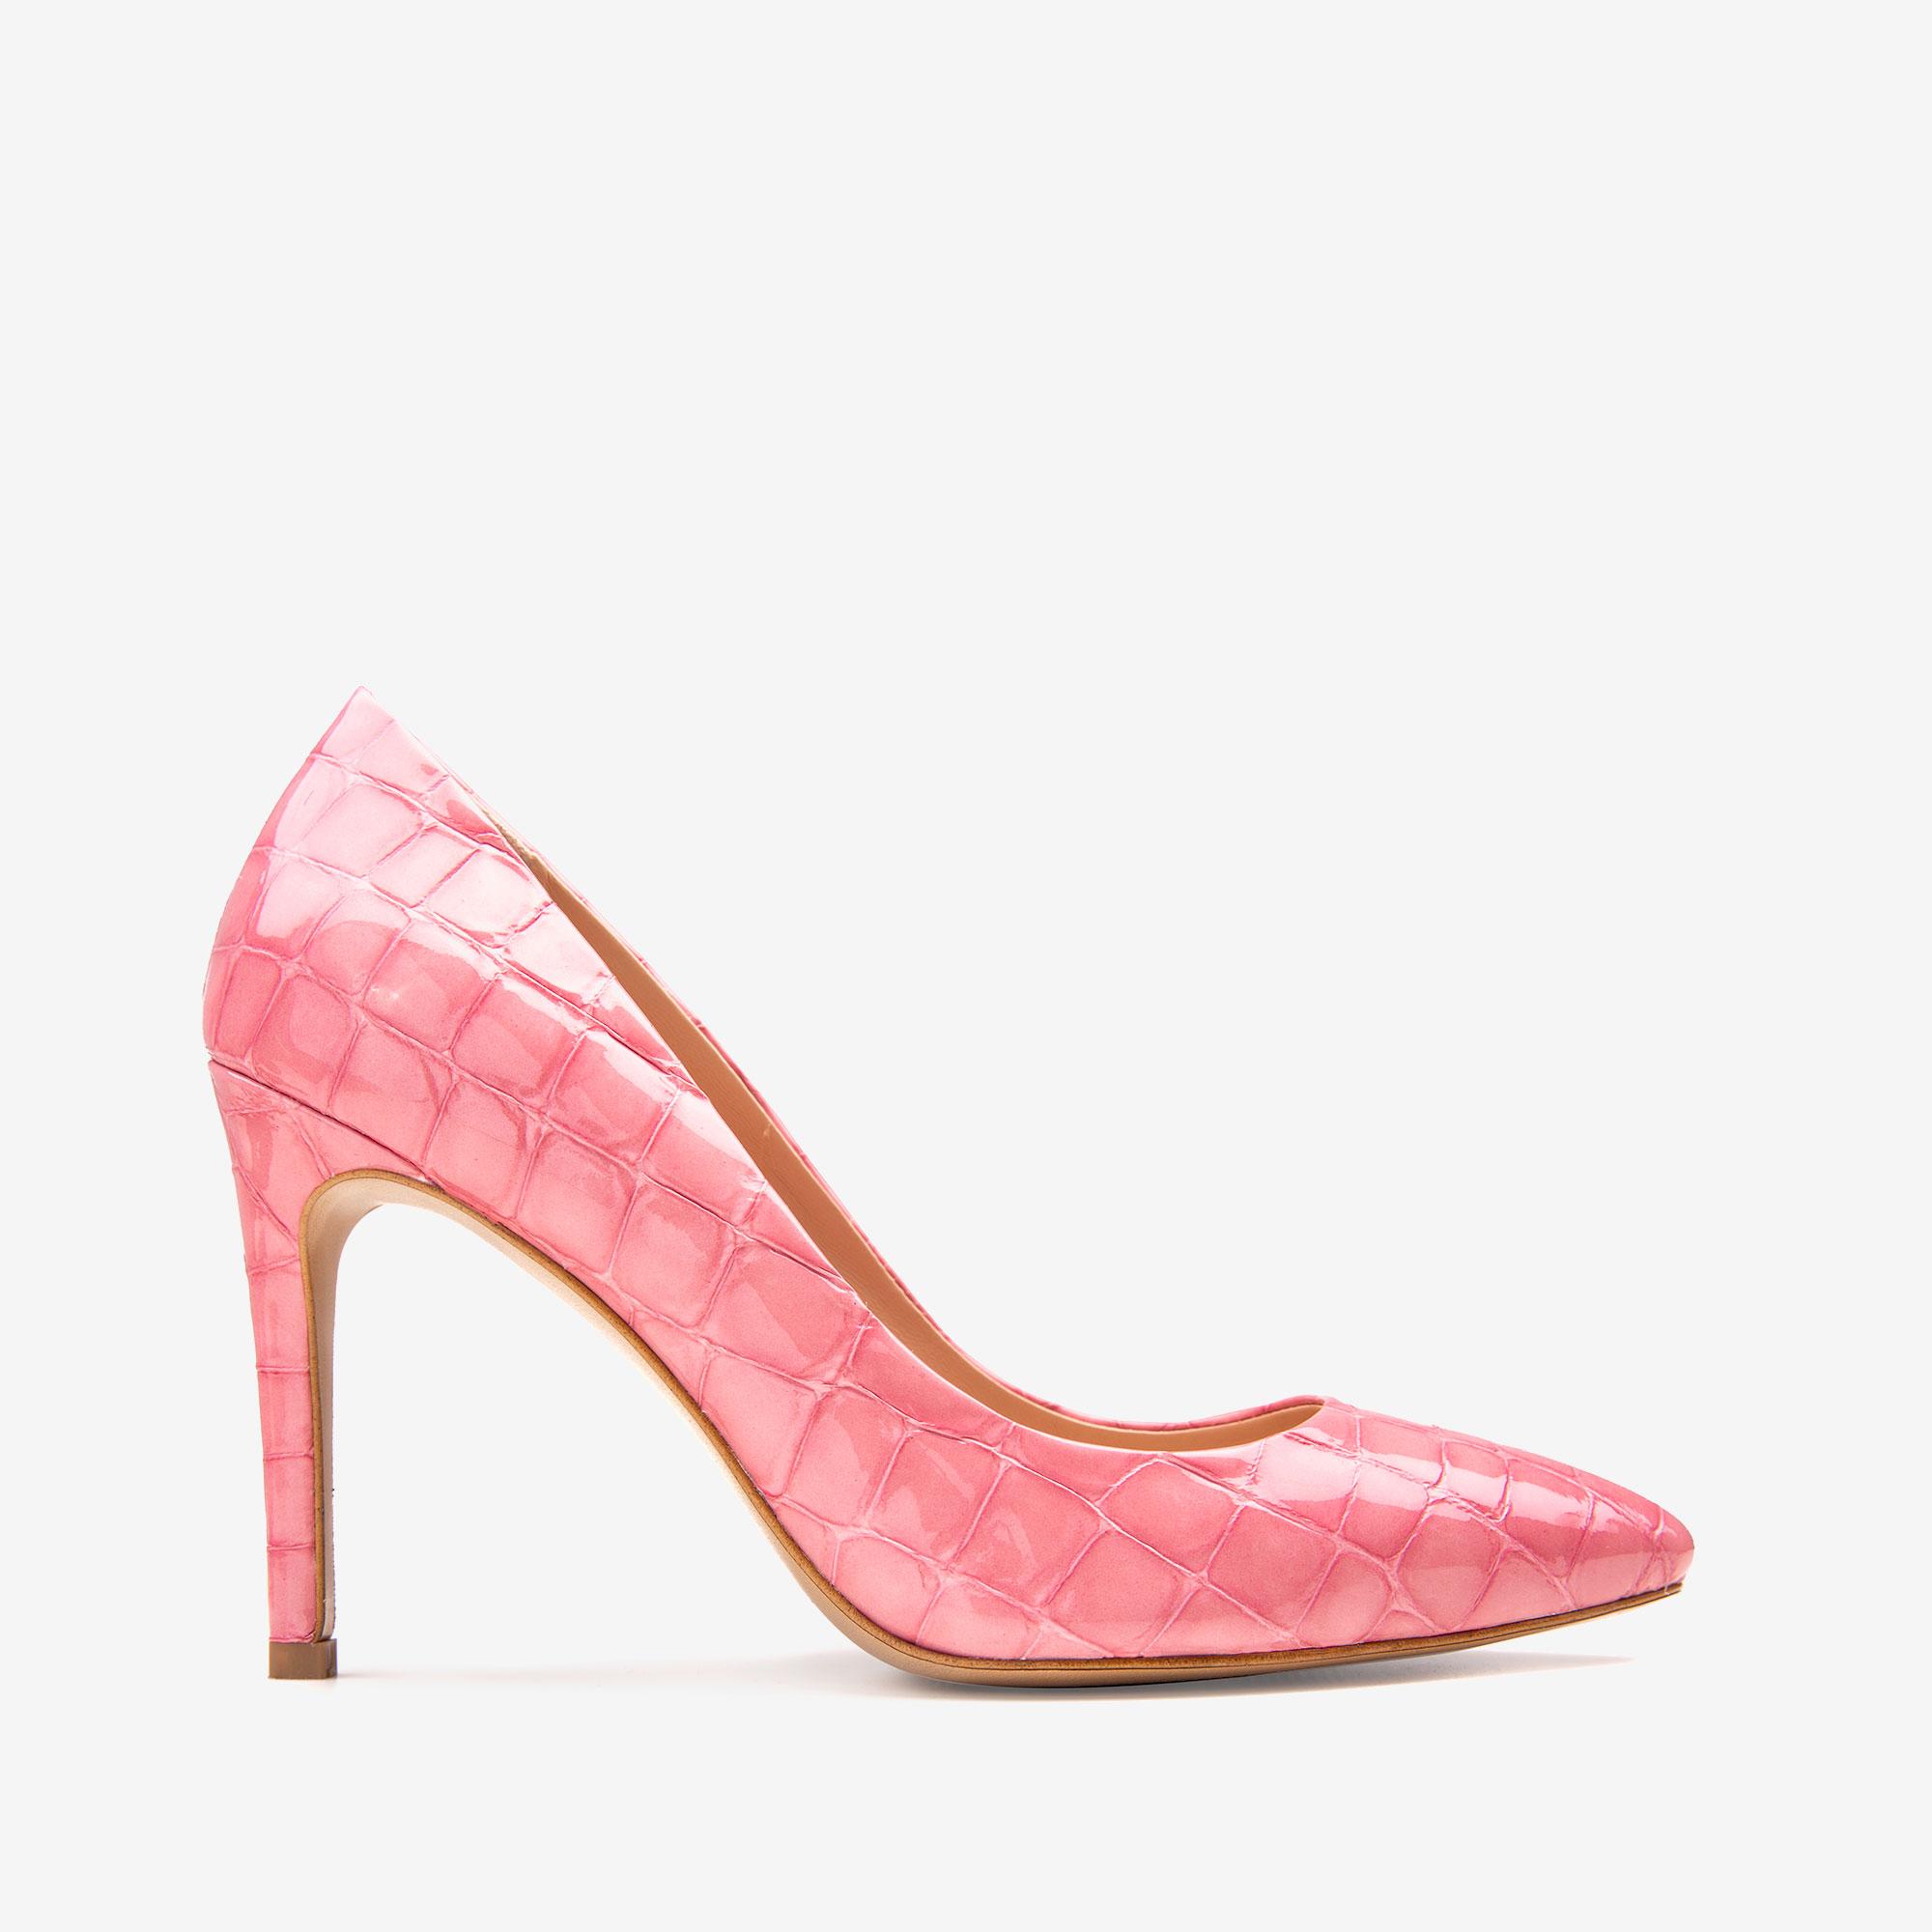 Pantofi cu varf ascutit din piele croco roz Ginissima imagine 0